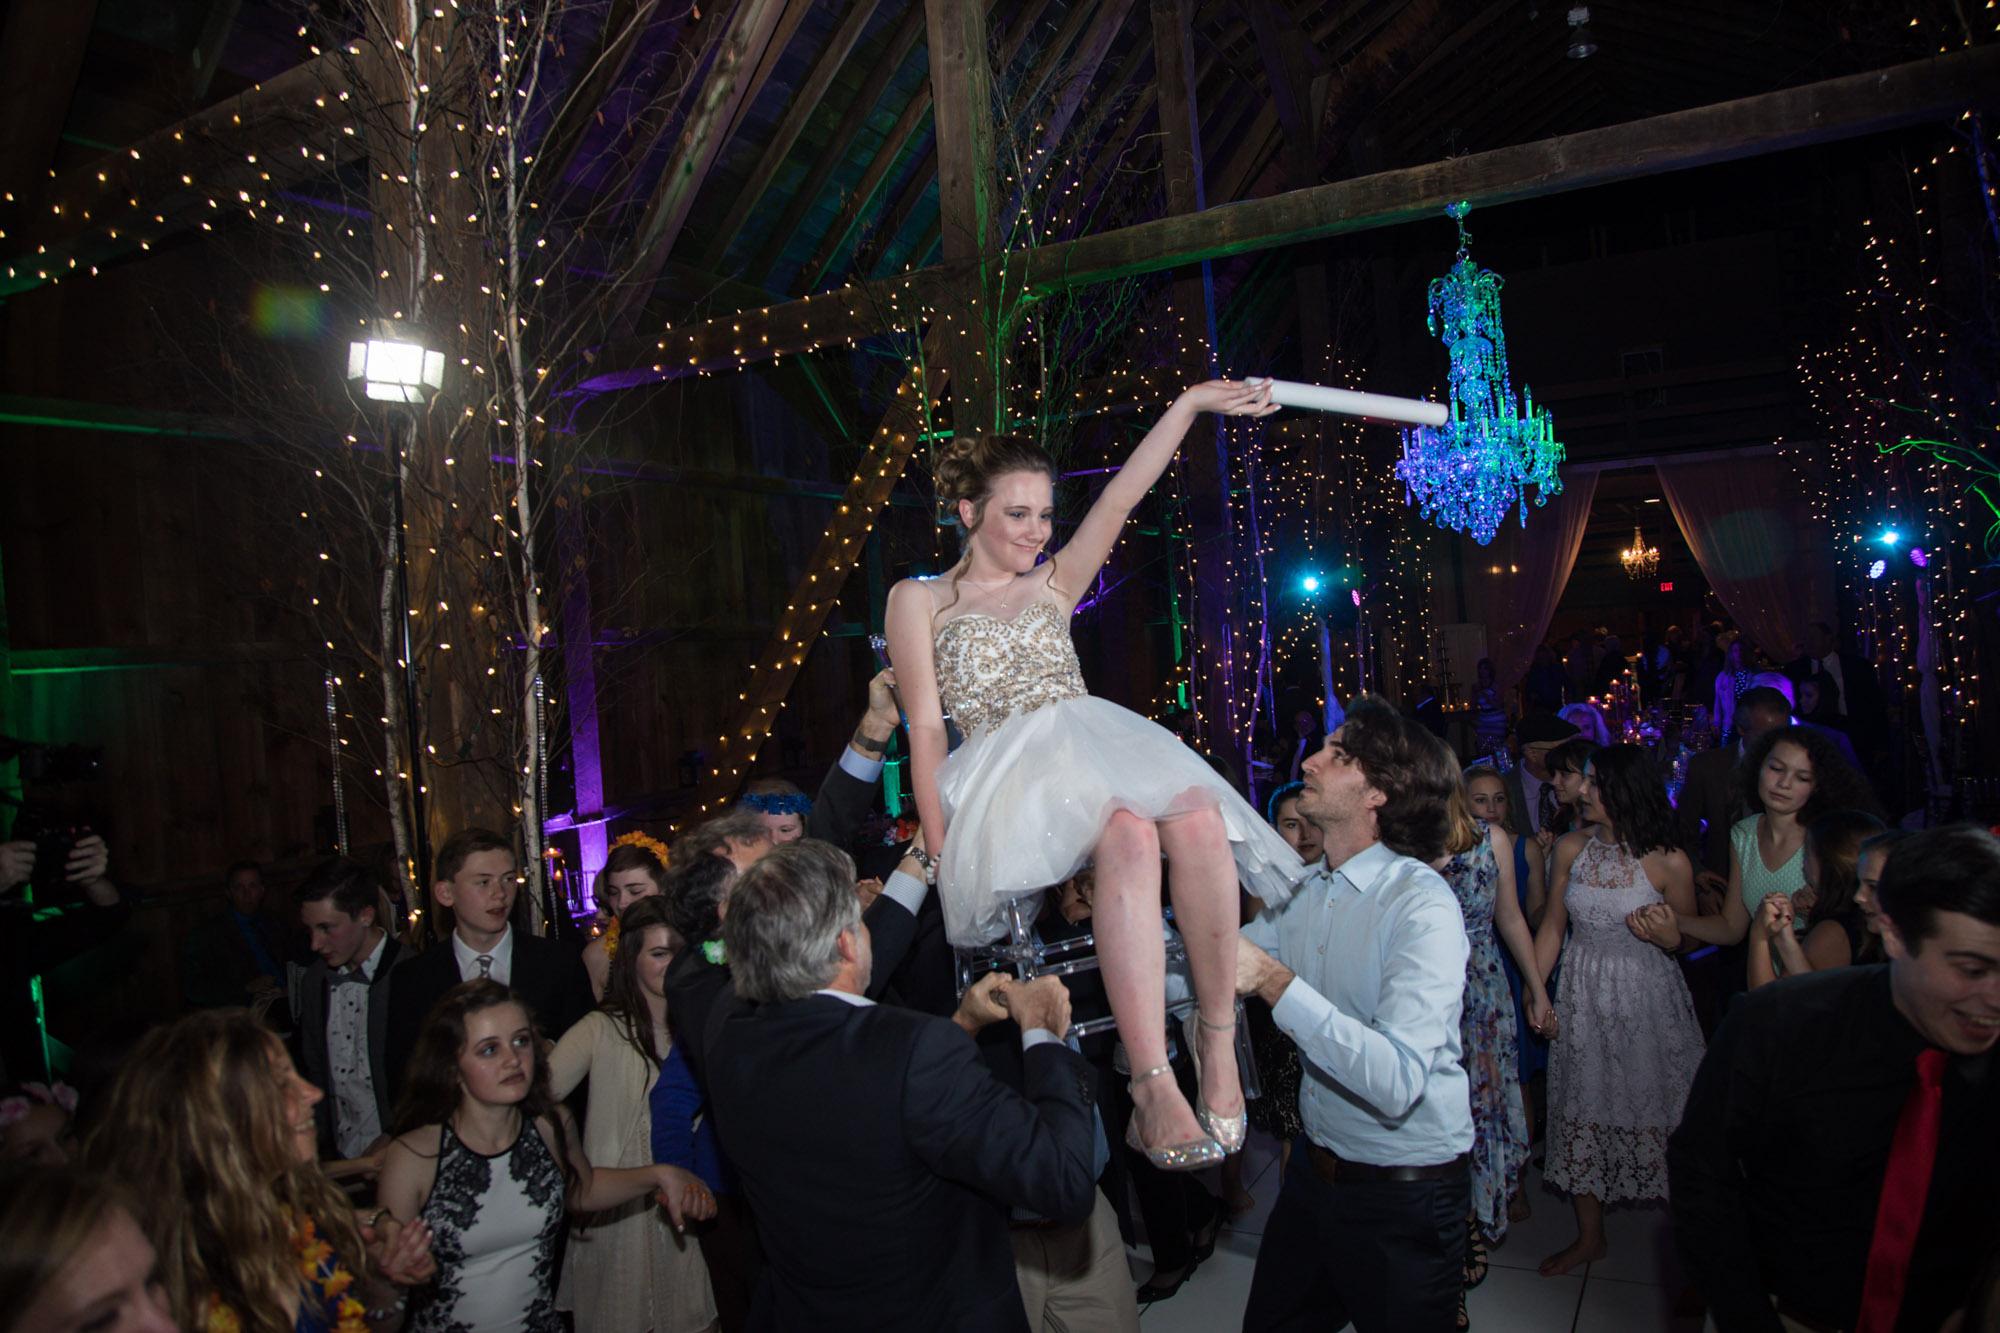 scranton_wedding_photographer_lettieri_pa (27 of 27).jpg